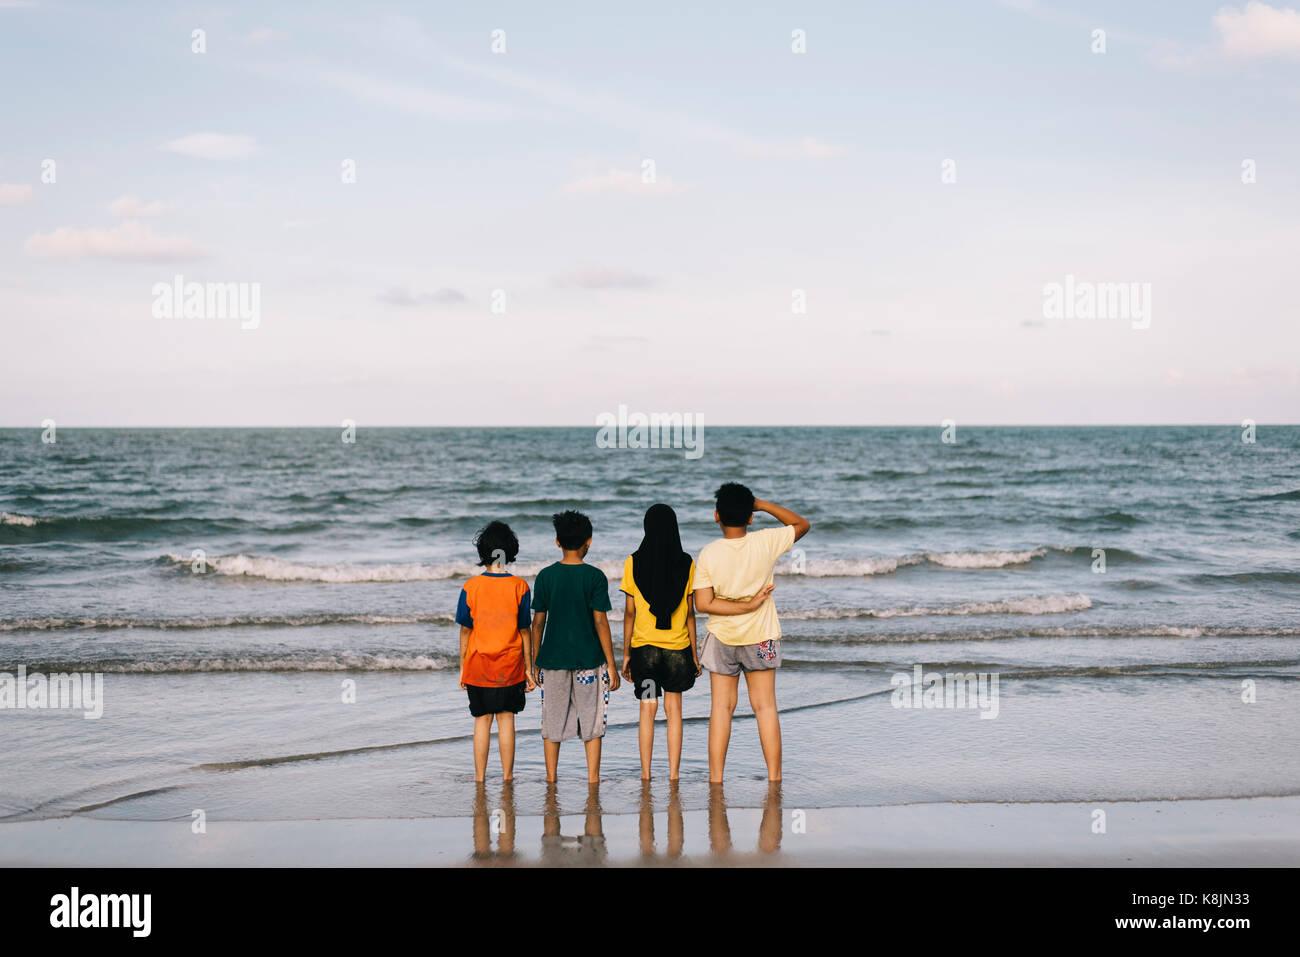 Kinder stehen am Strand mit Meerblick. Freundschaft Konzept. Familie Ferien Konzept Konzept. Stockbild